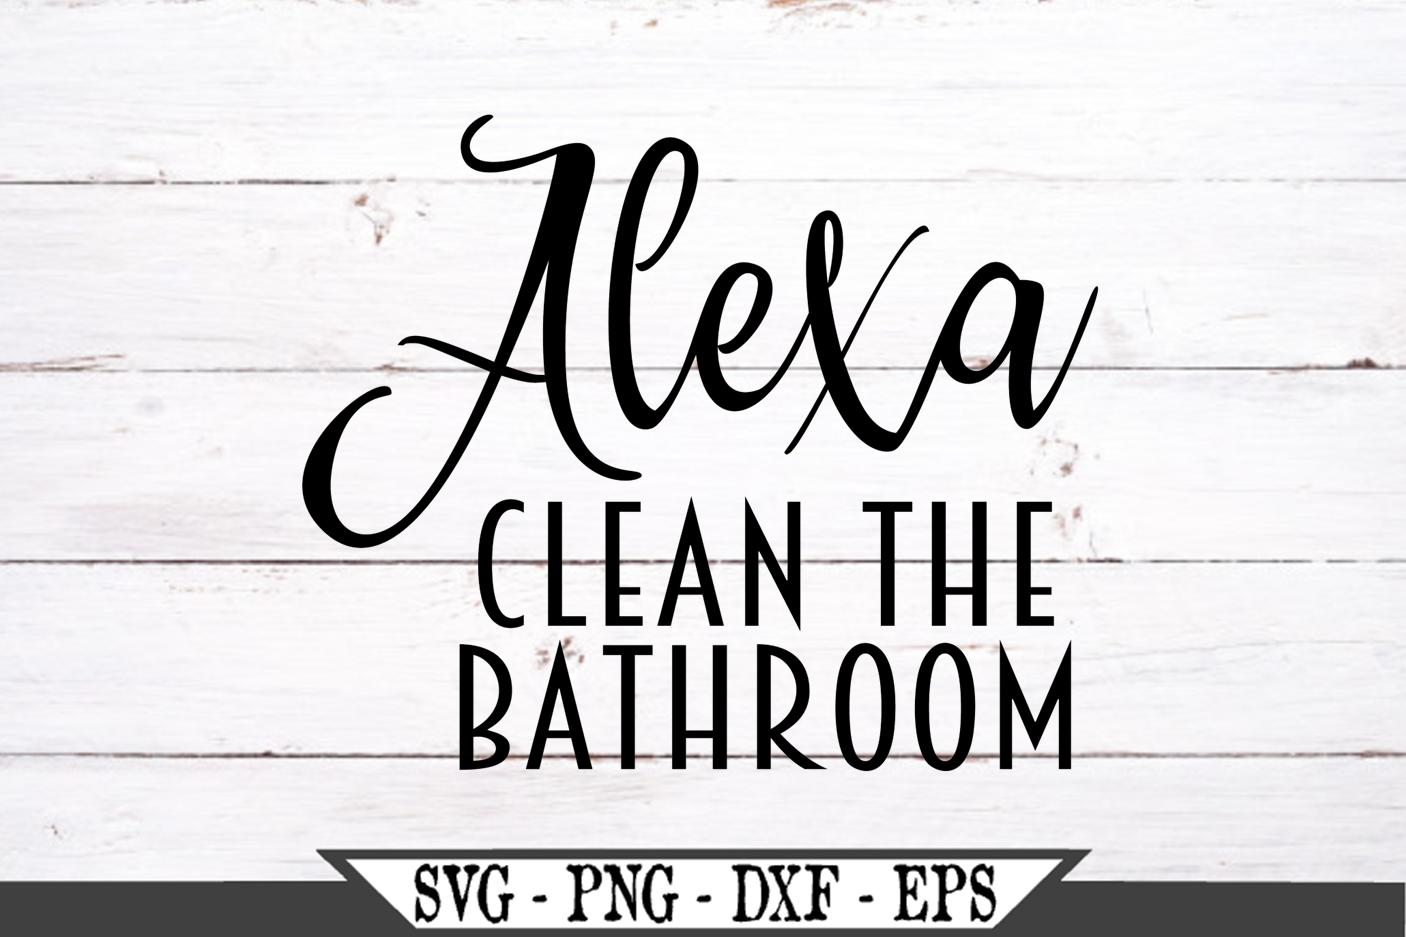 Alexa Clean The Bathroom SVG example image 2